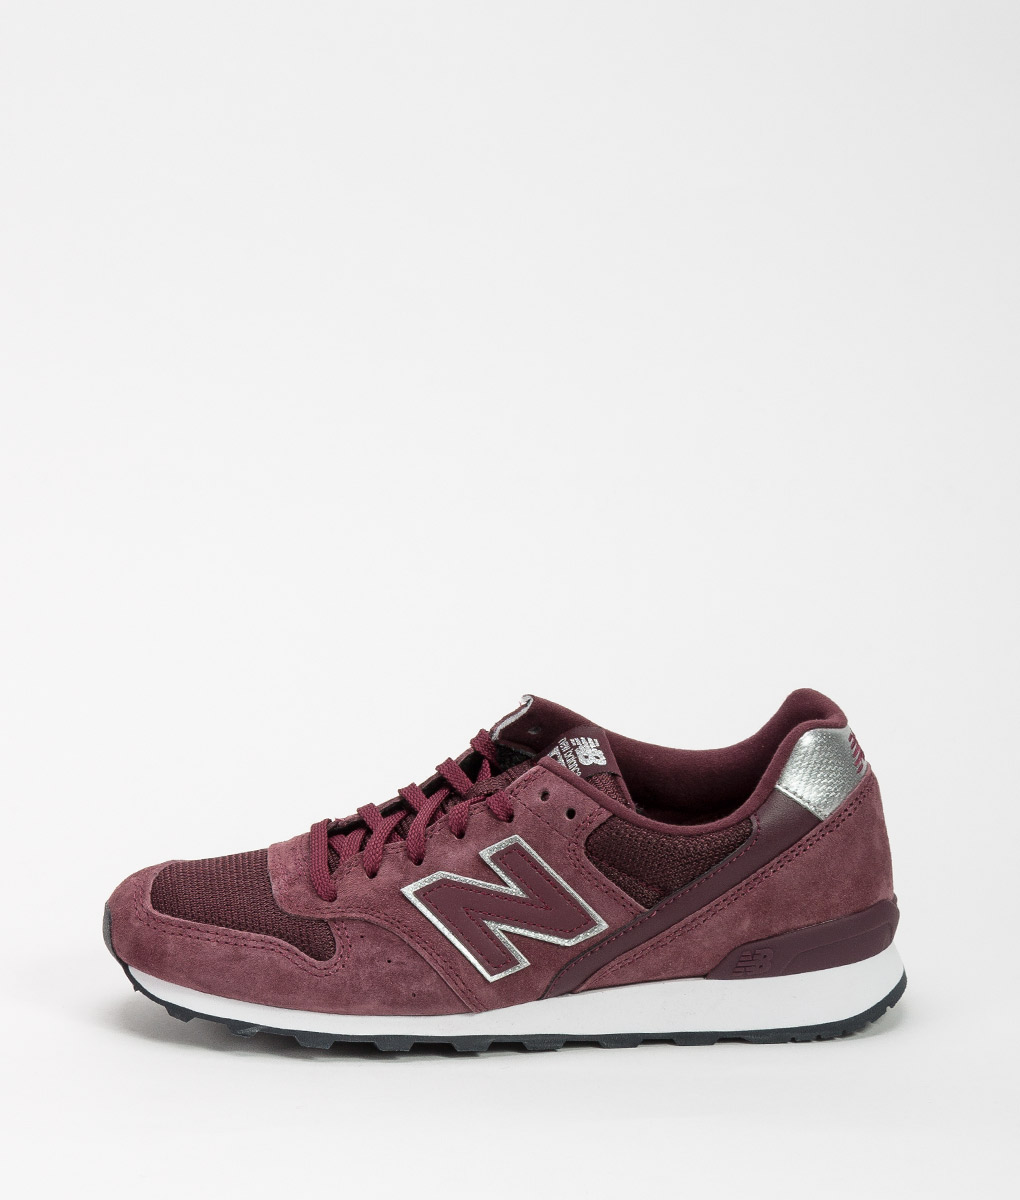 new balance womens burgundy trainers